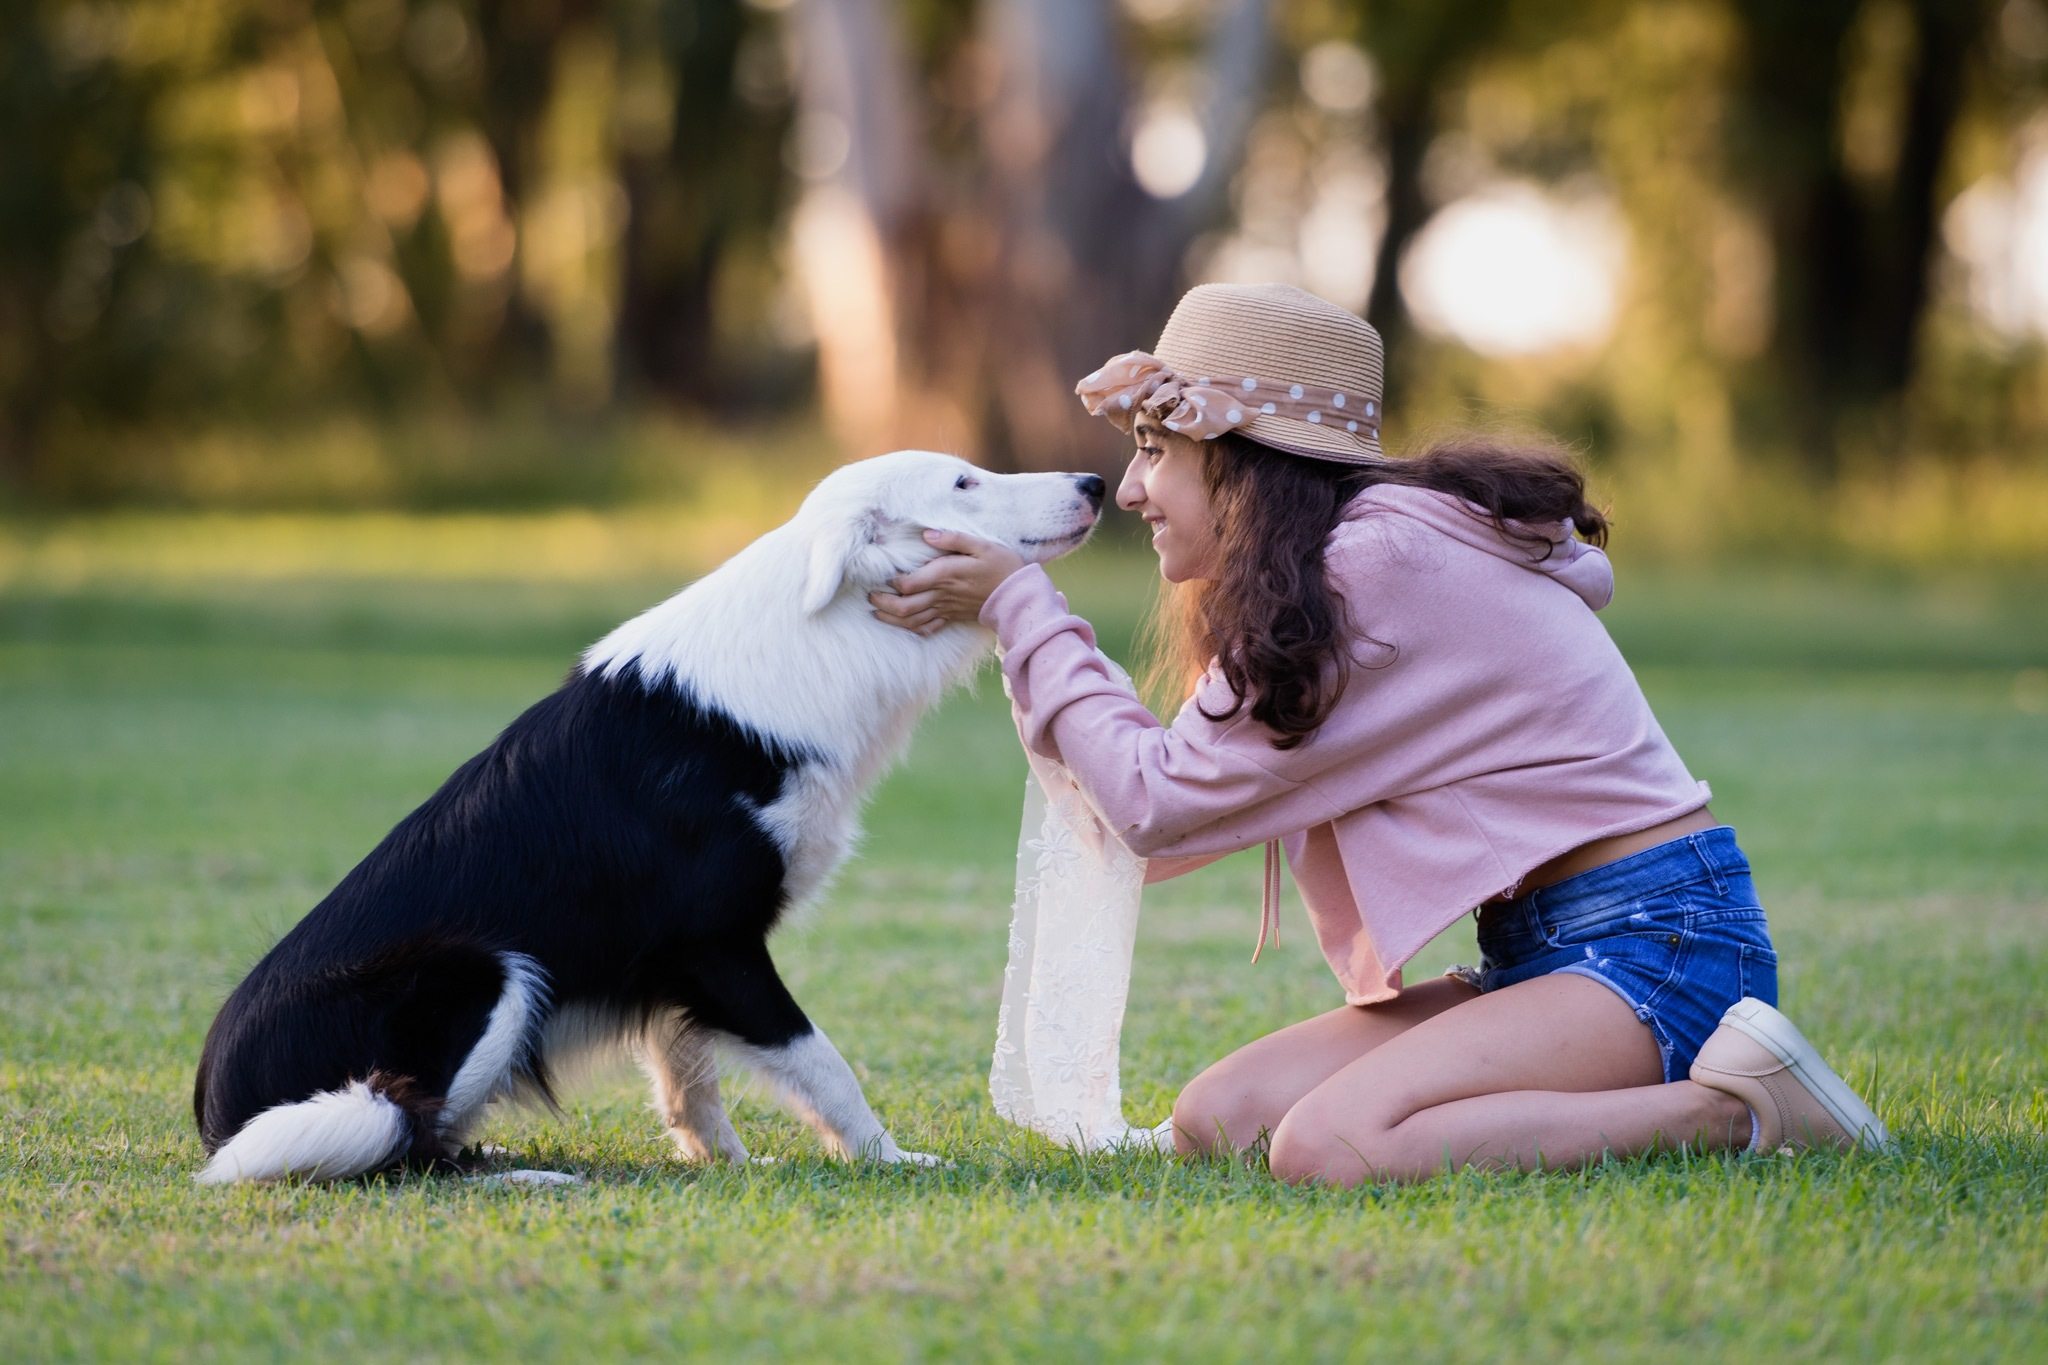 Lola and her dog by clarandaburu